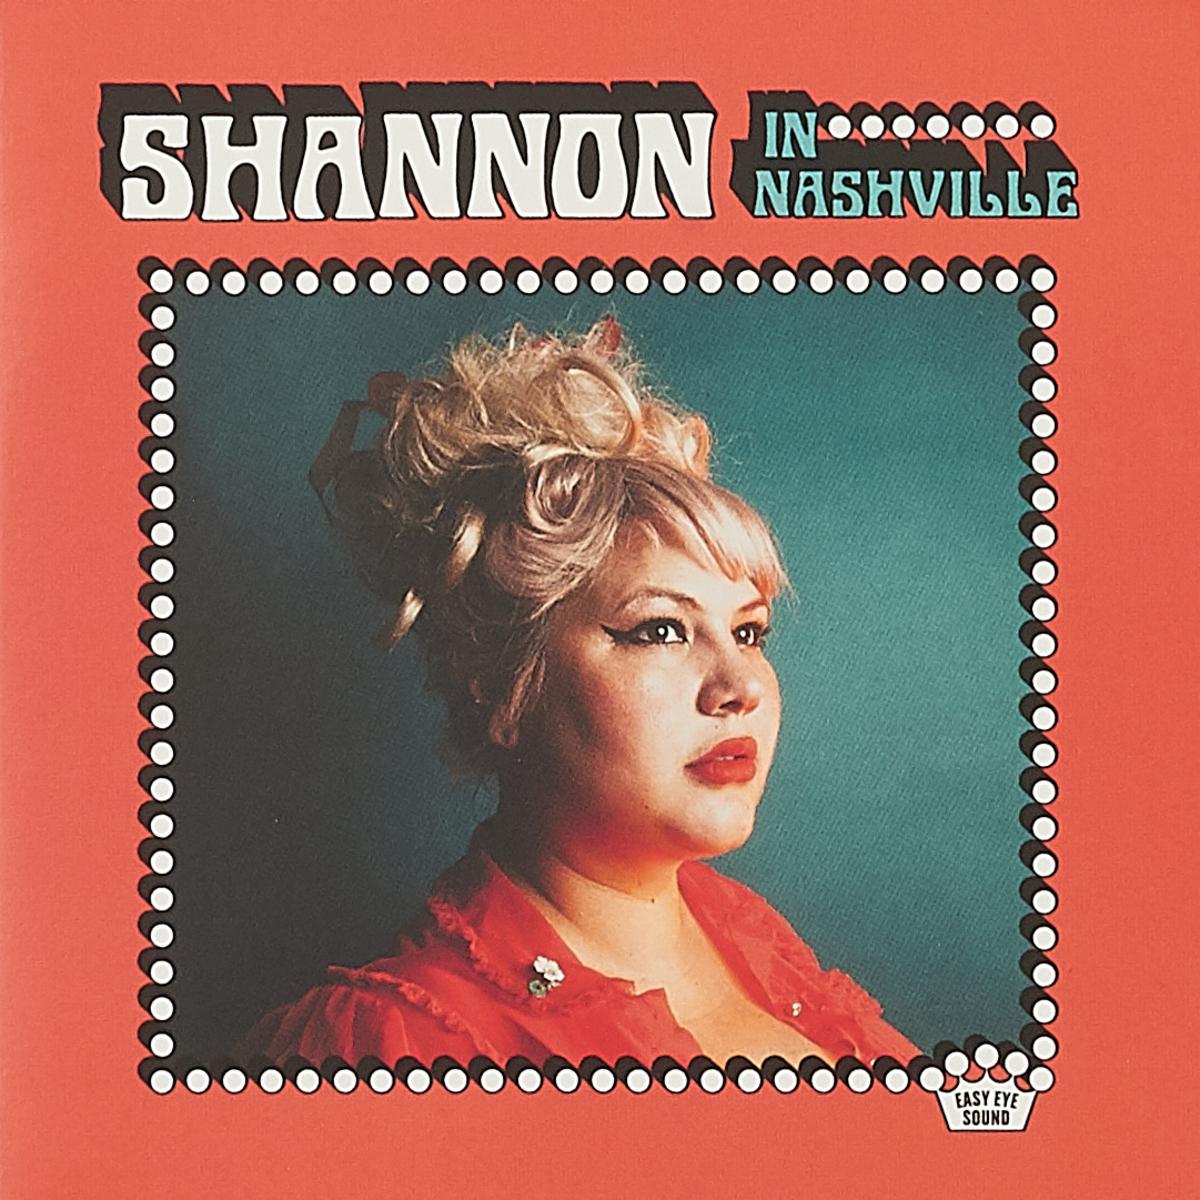 Shannon Shaw Shaw. In Nashville